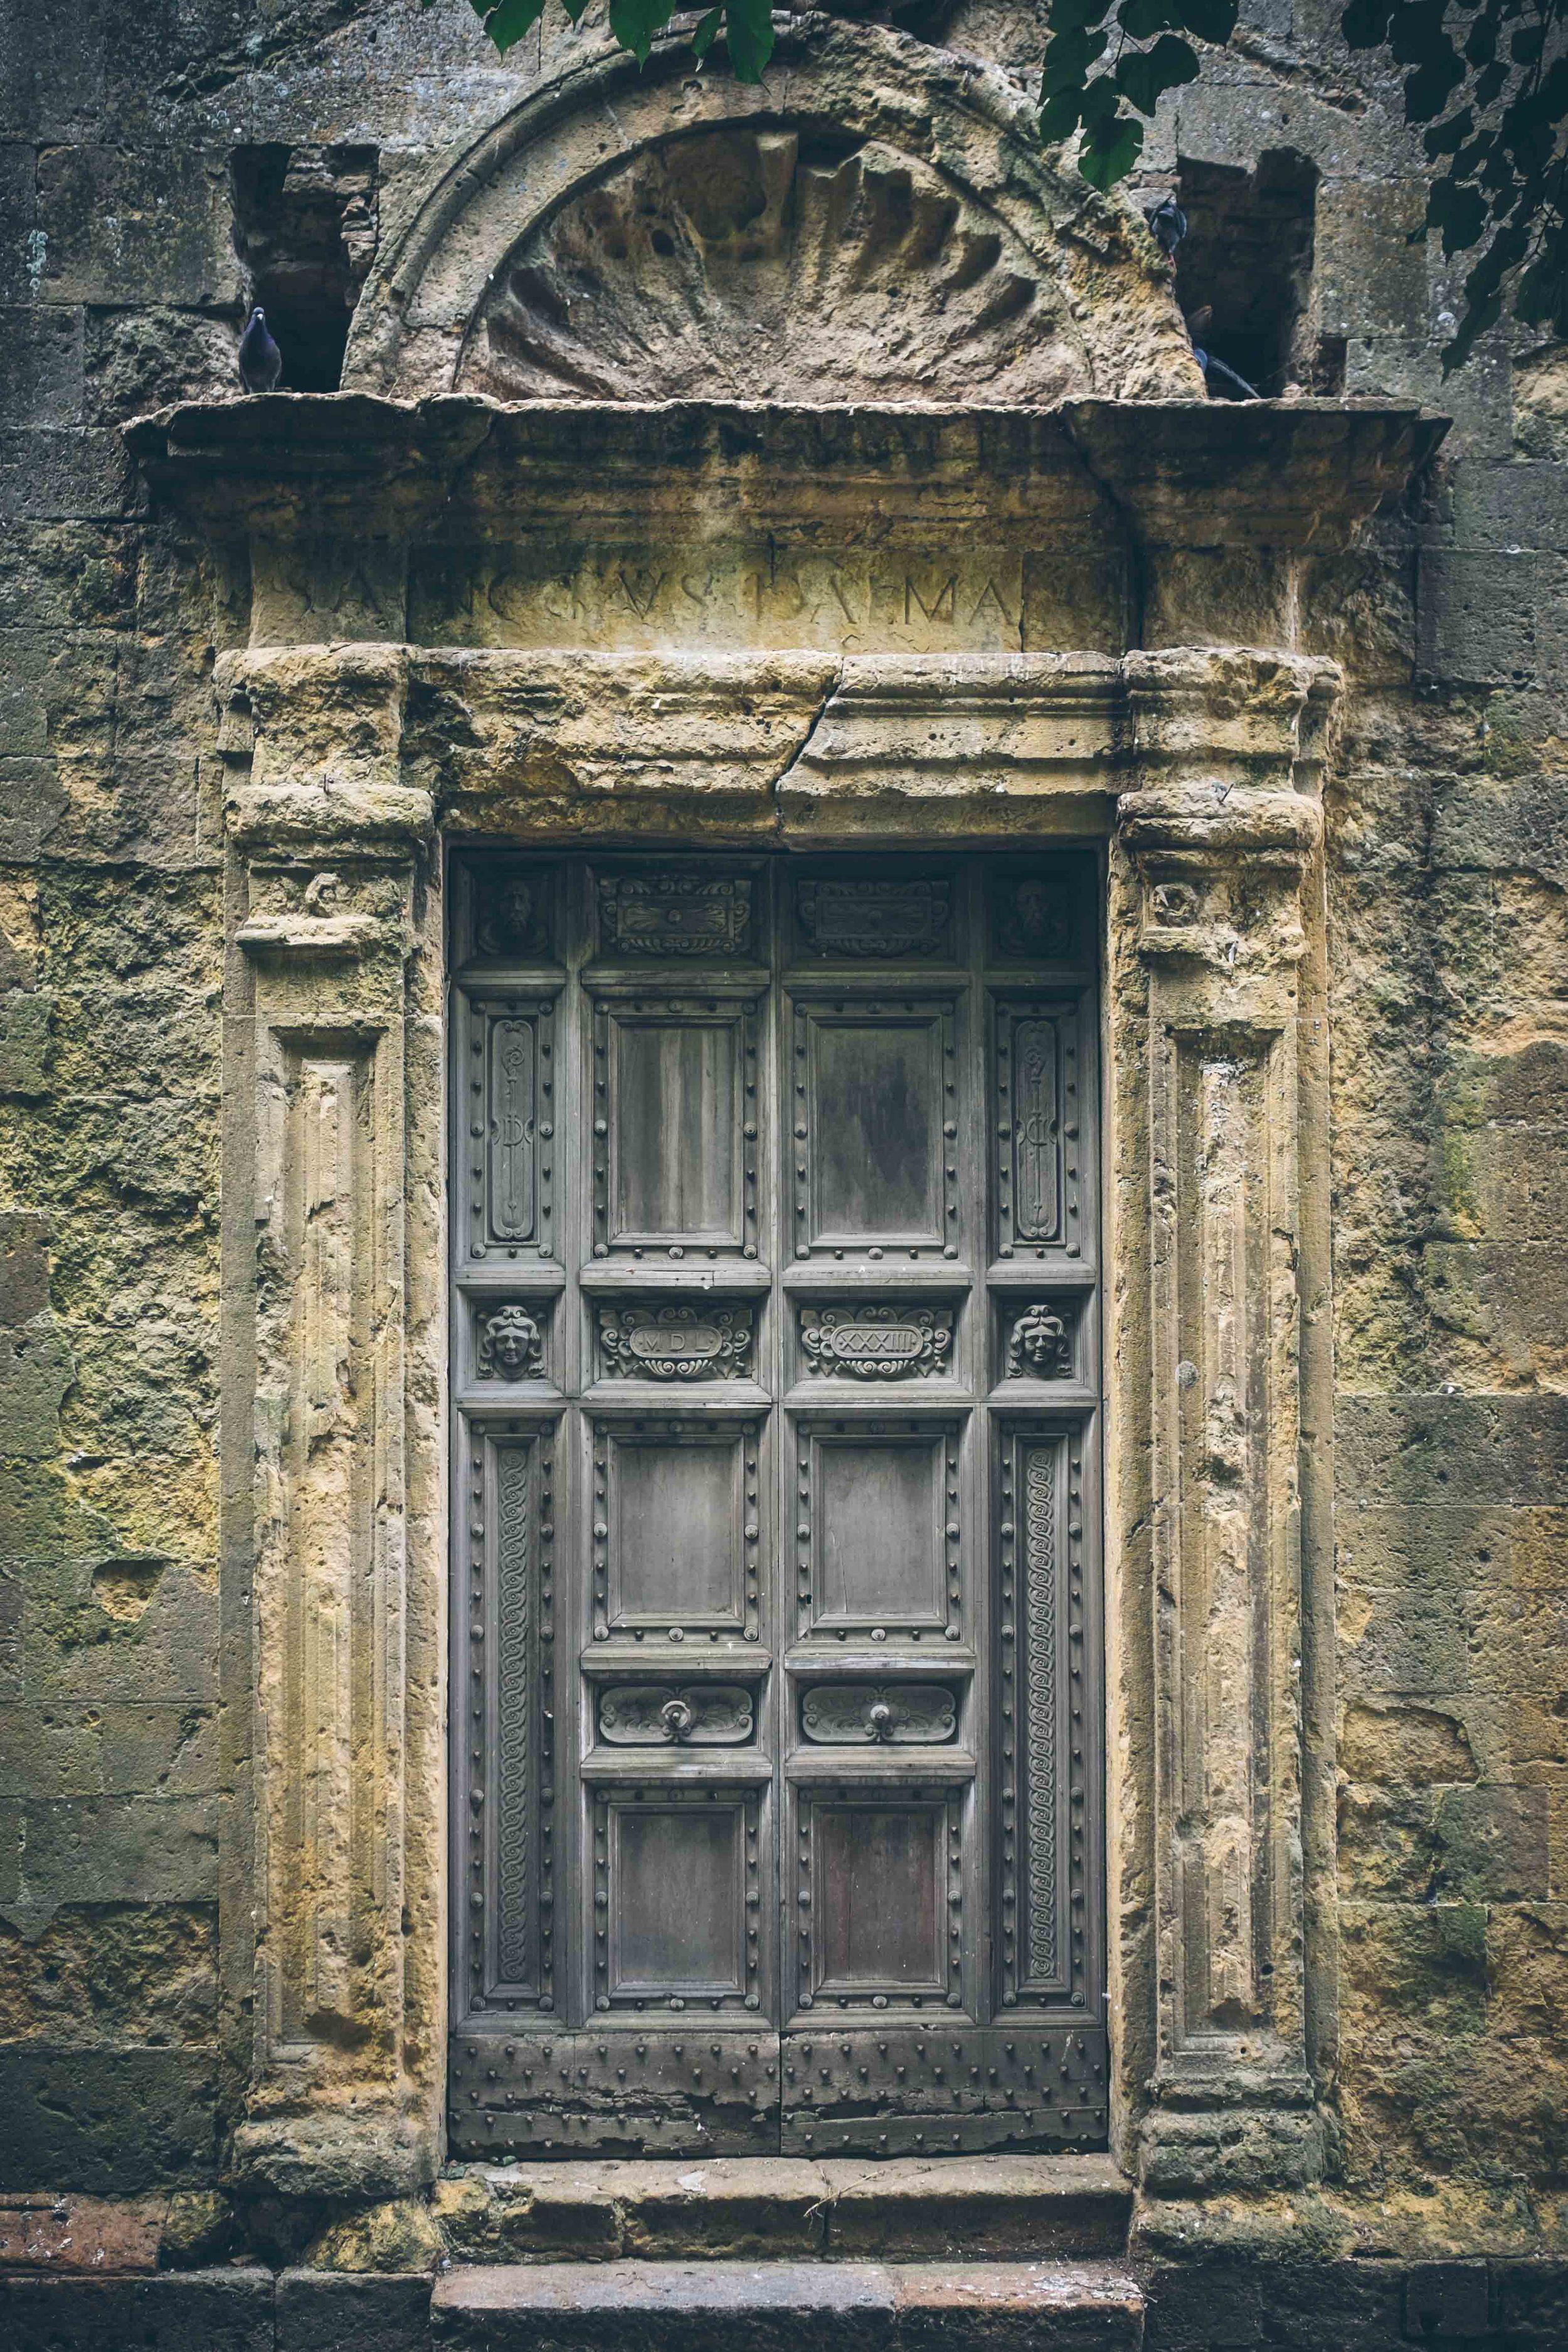 Doorway, Tomb Raider style